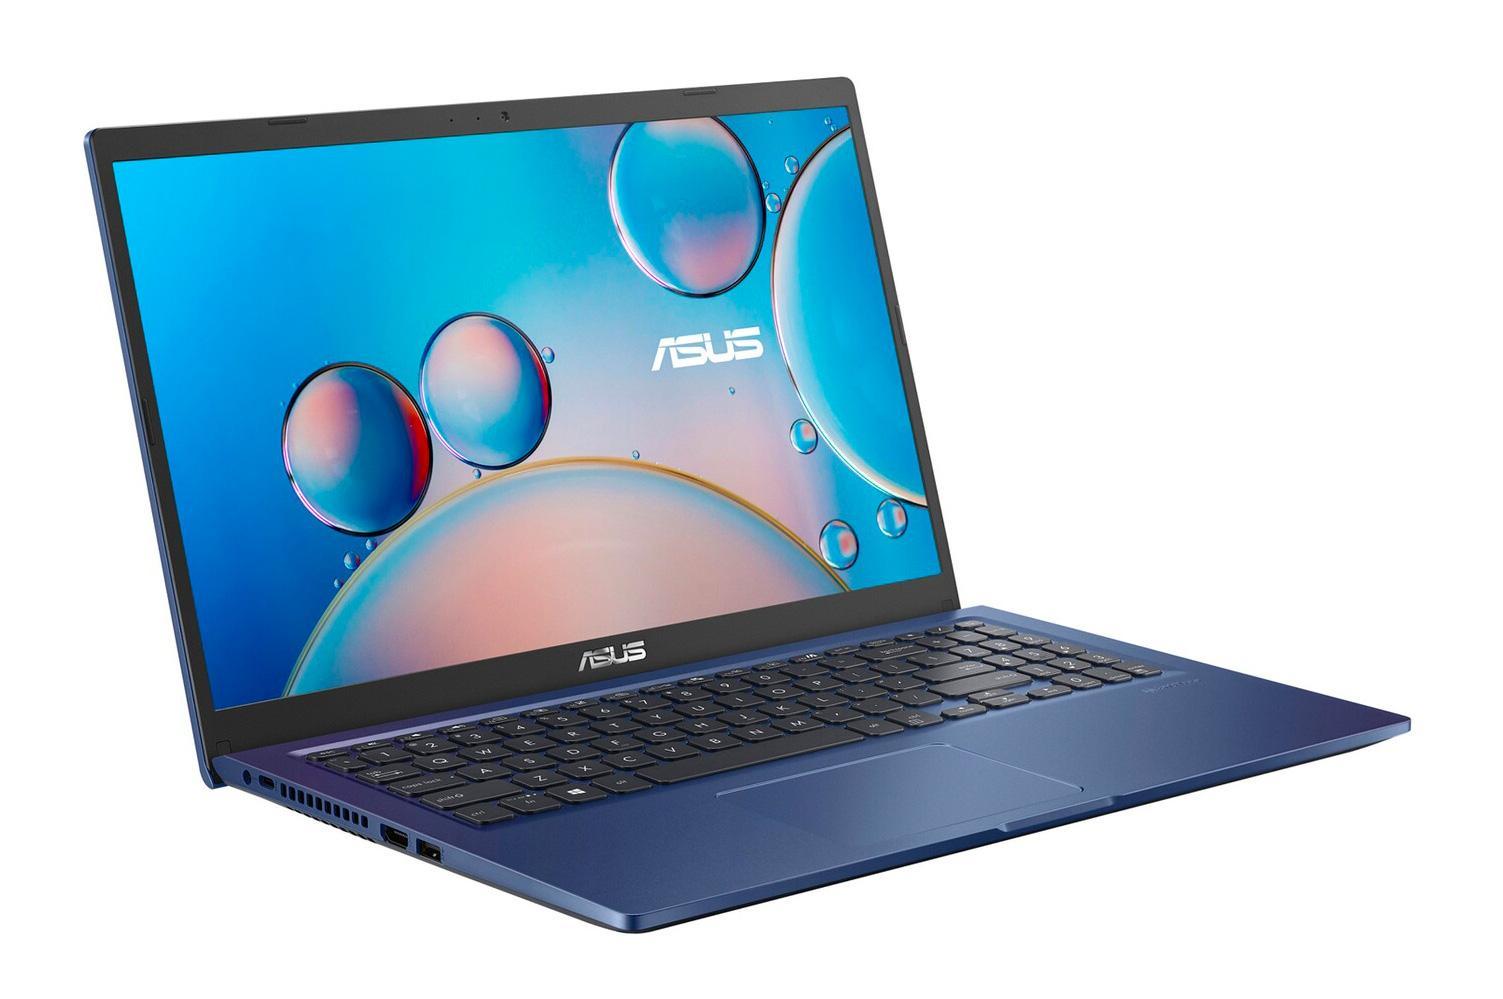 Image du PC portable Asus S516JA-BQ1752T Bleu